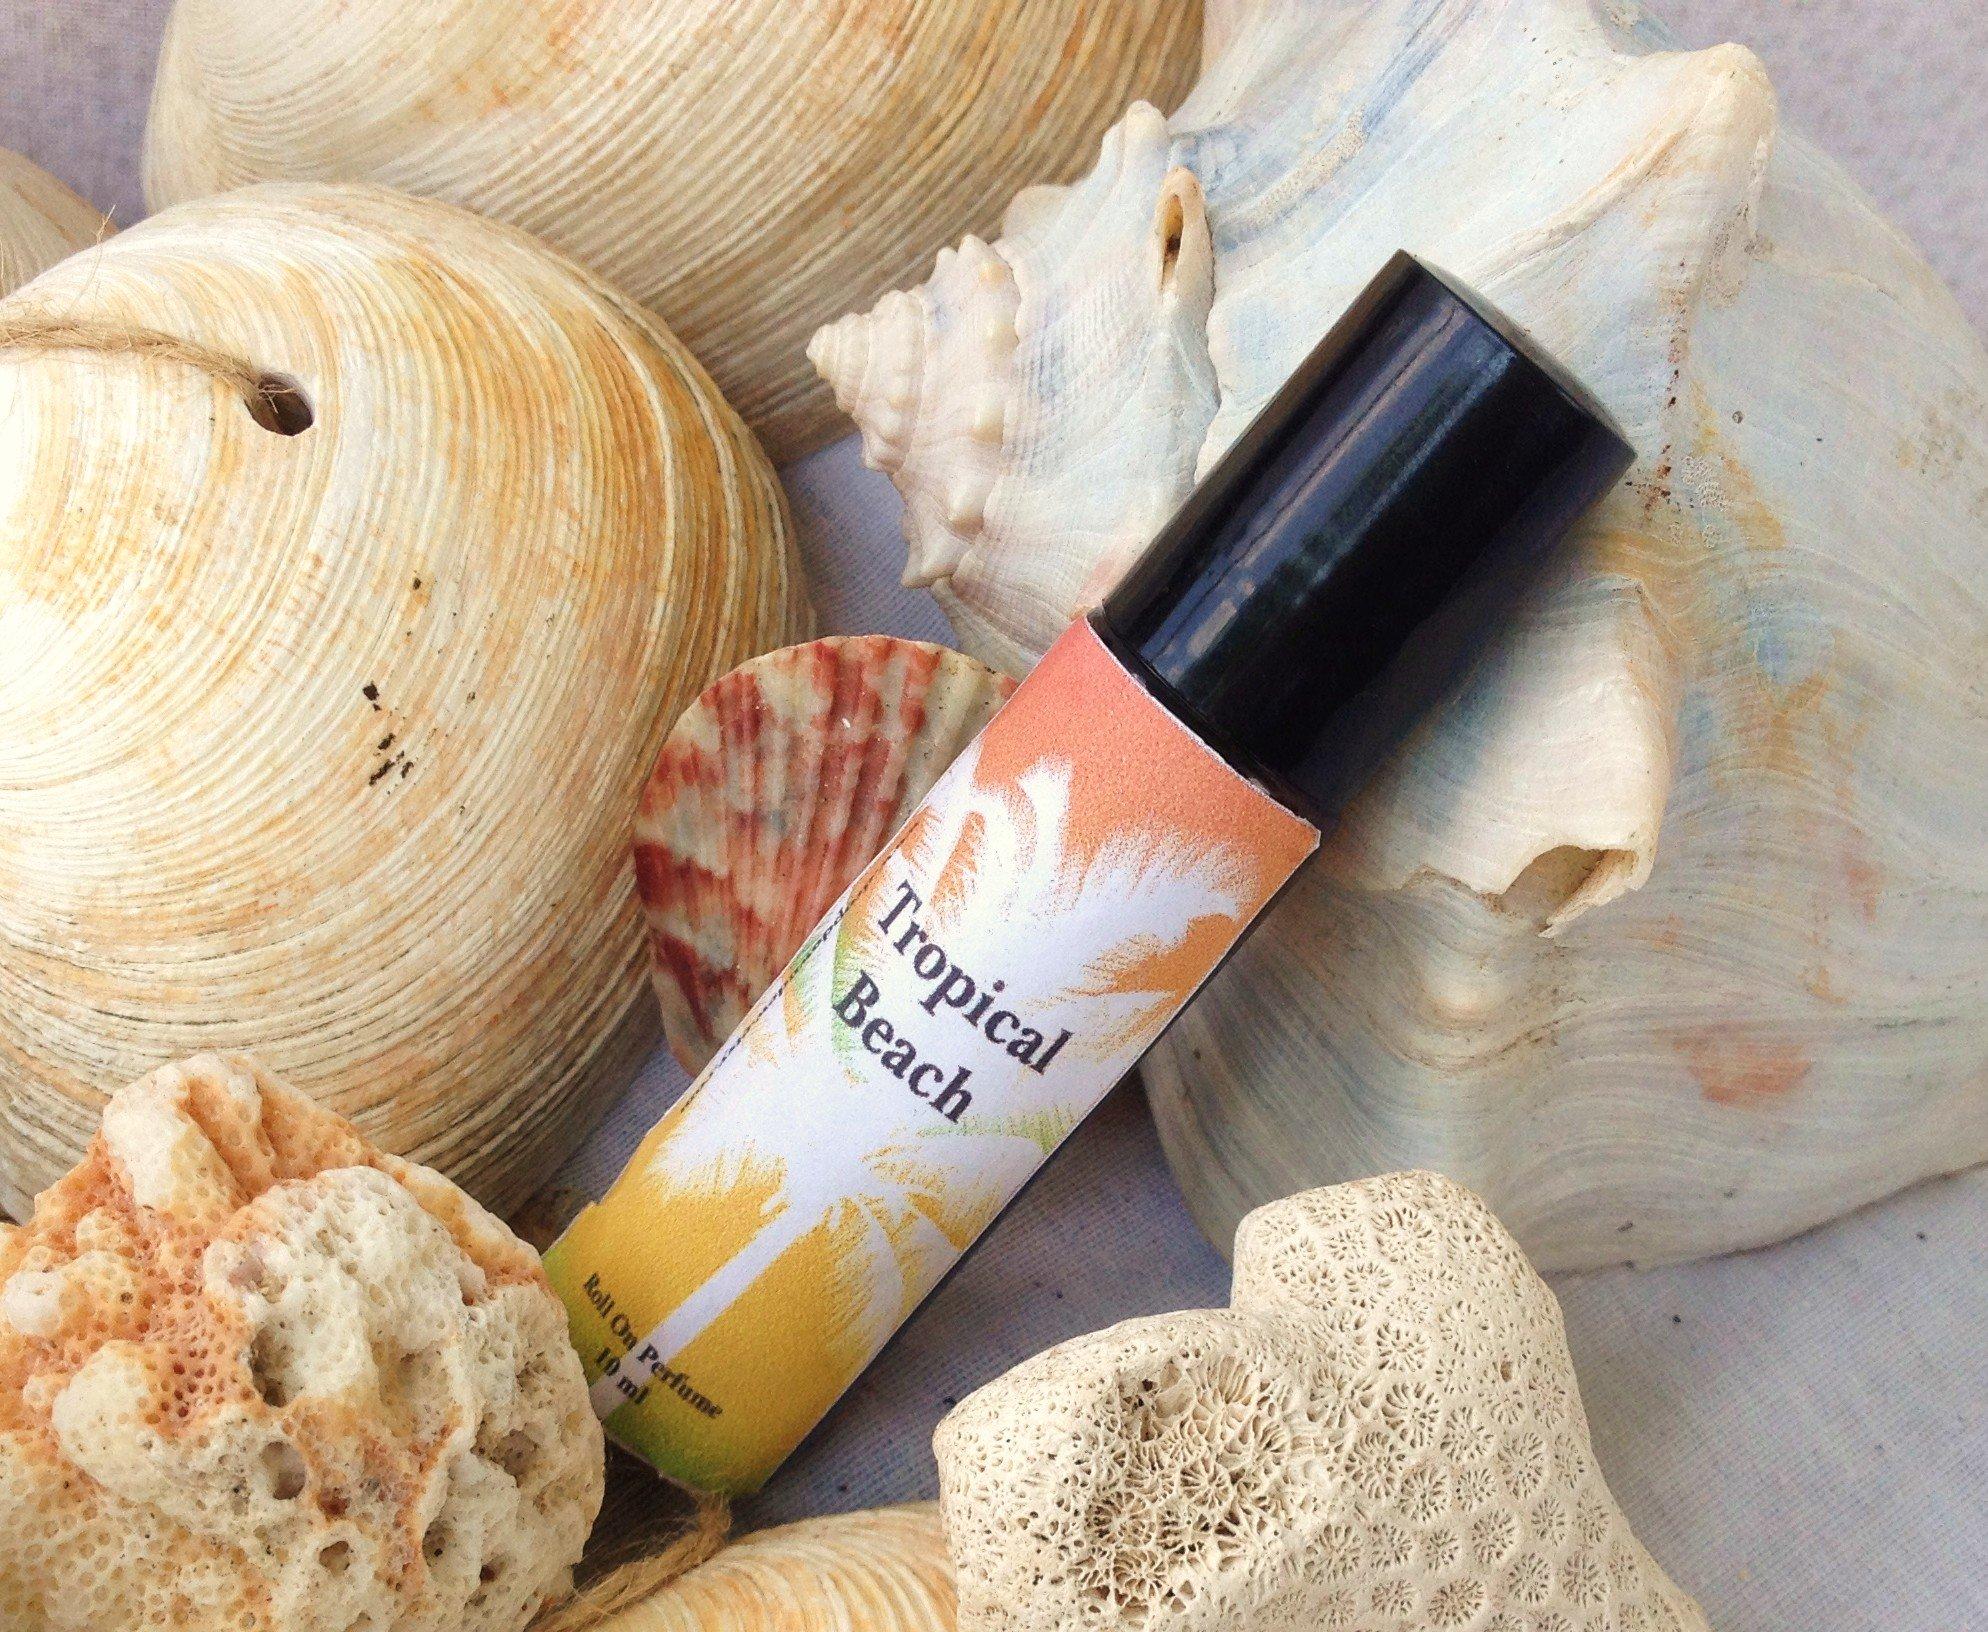 Tropical Beach Roll On Perfume, Coconut Scent, Beach Scent, Tropical Scent, Perfume Roll On, Aromatherapy, 10 ml Perfume, Fragrance Oil